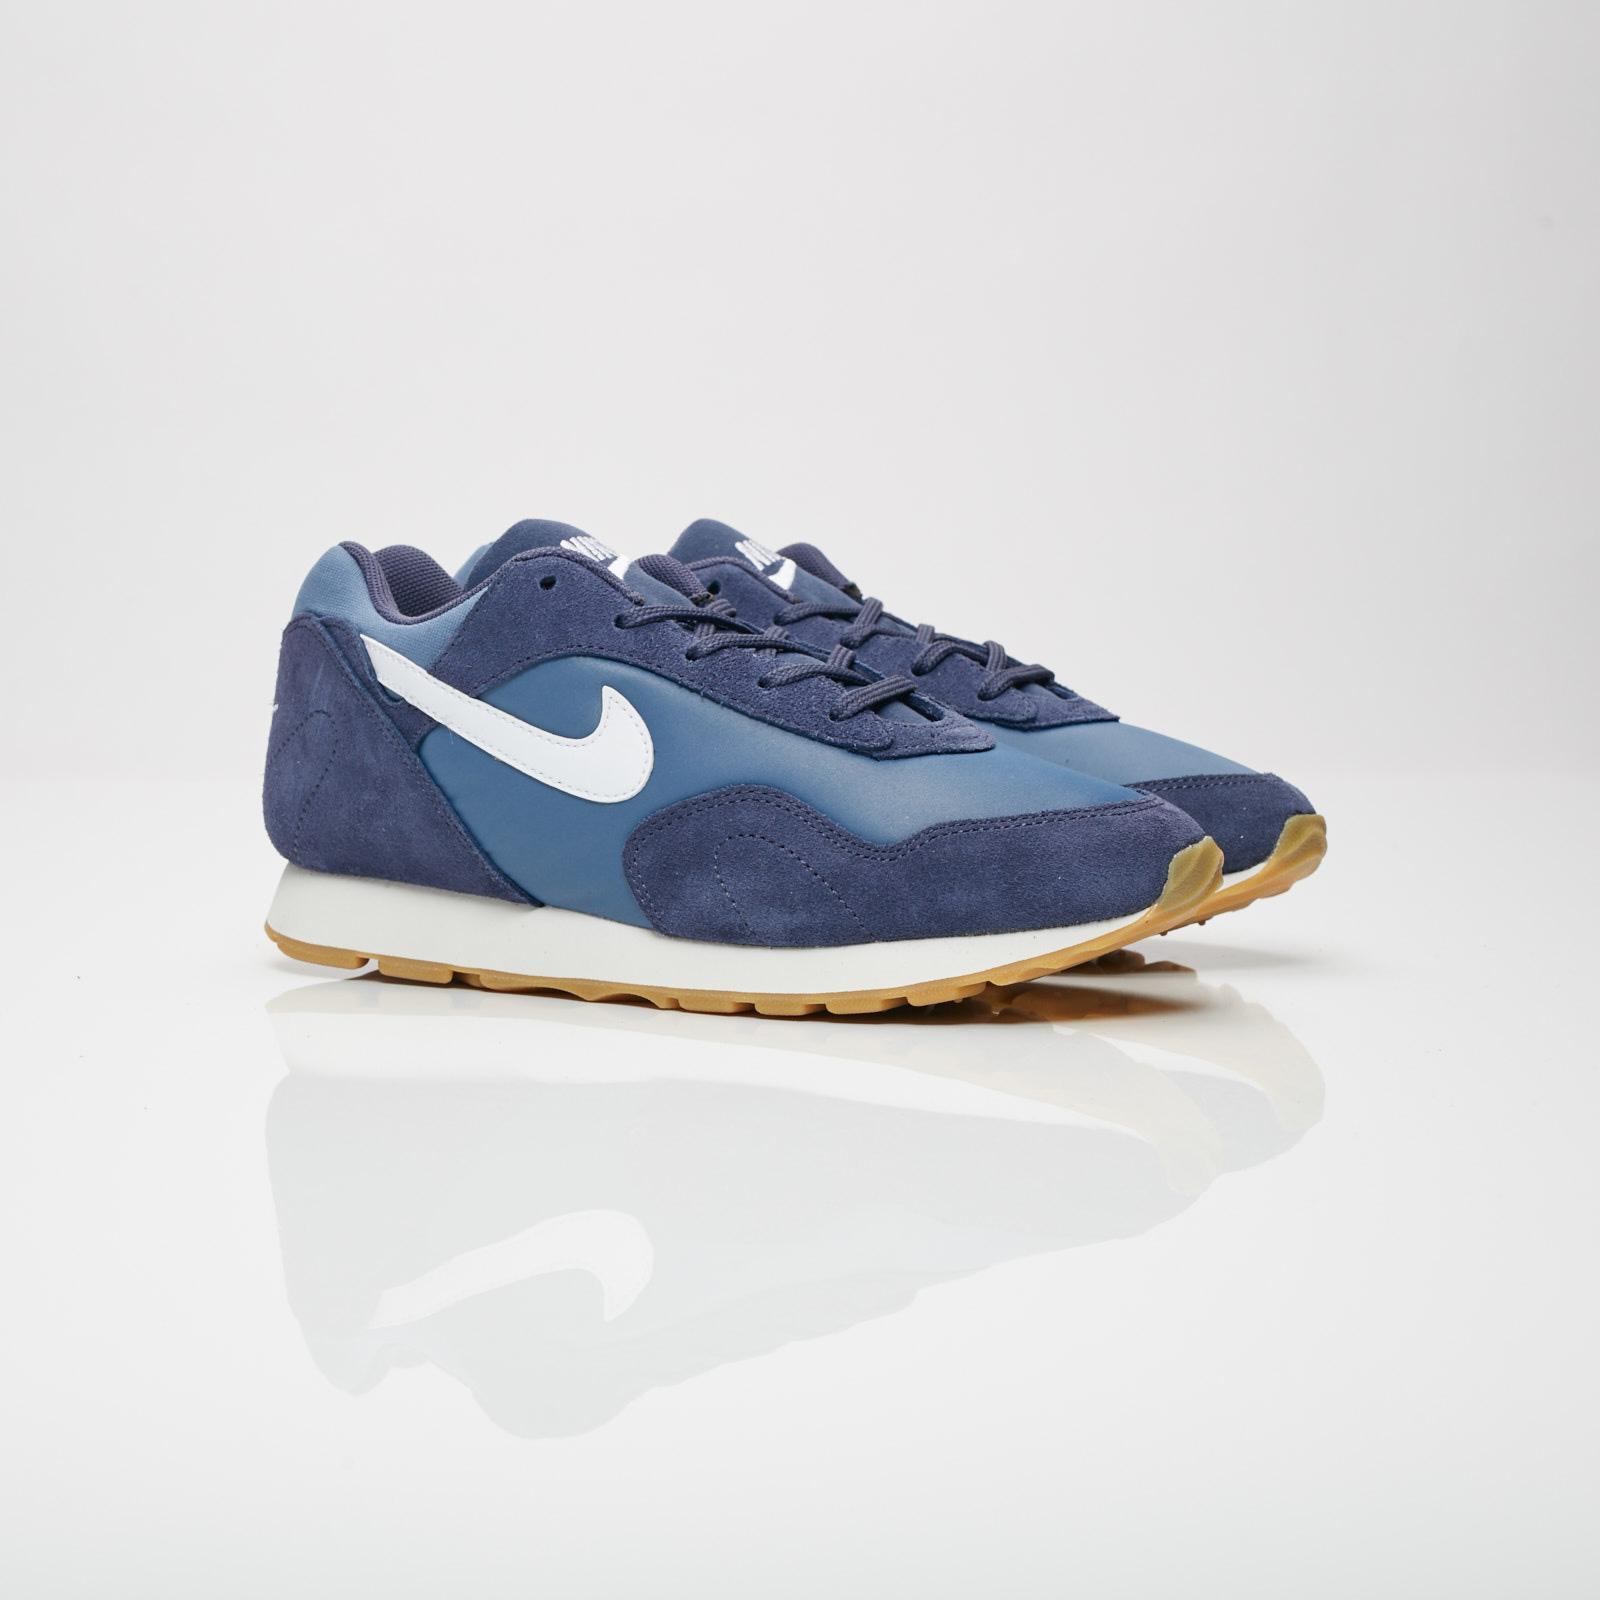 new products f0391 eff22 Nike Sportswear W Outburst